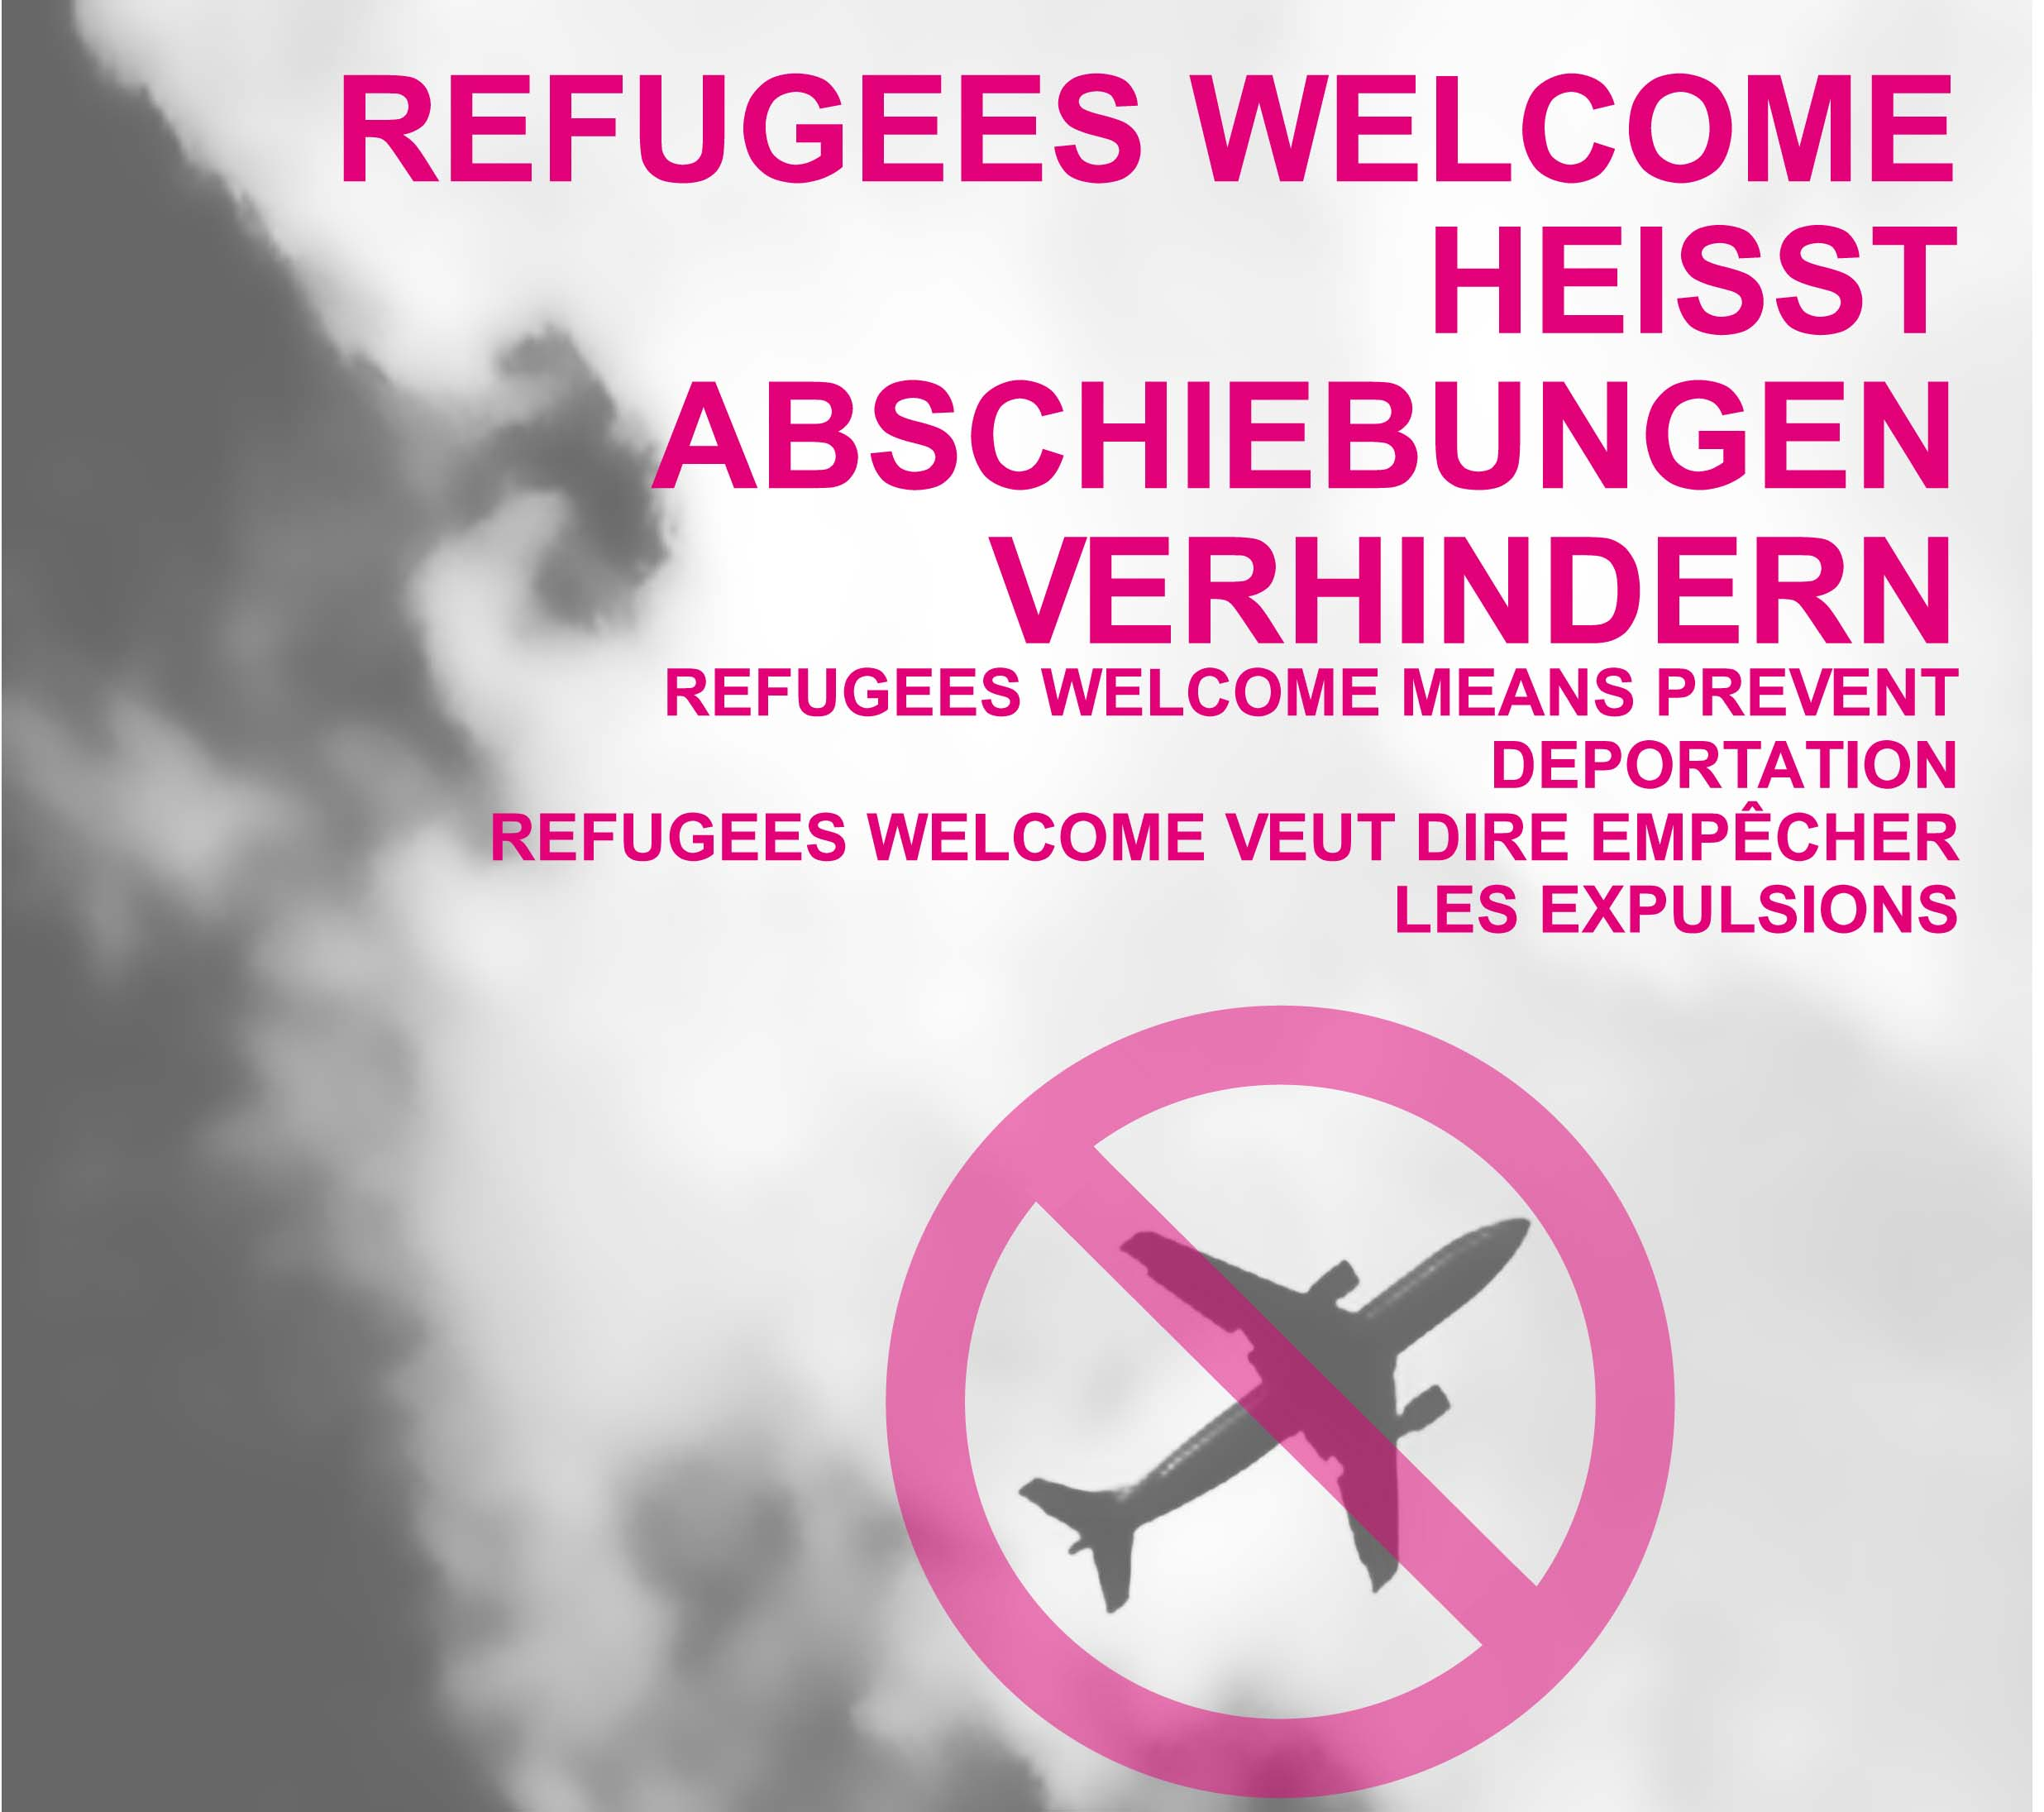 Refugees Welcome heißt Abschiebungen verhindern – Veranstaltung am 20. Januar